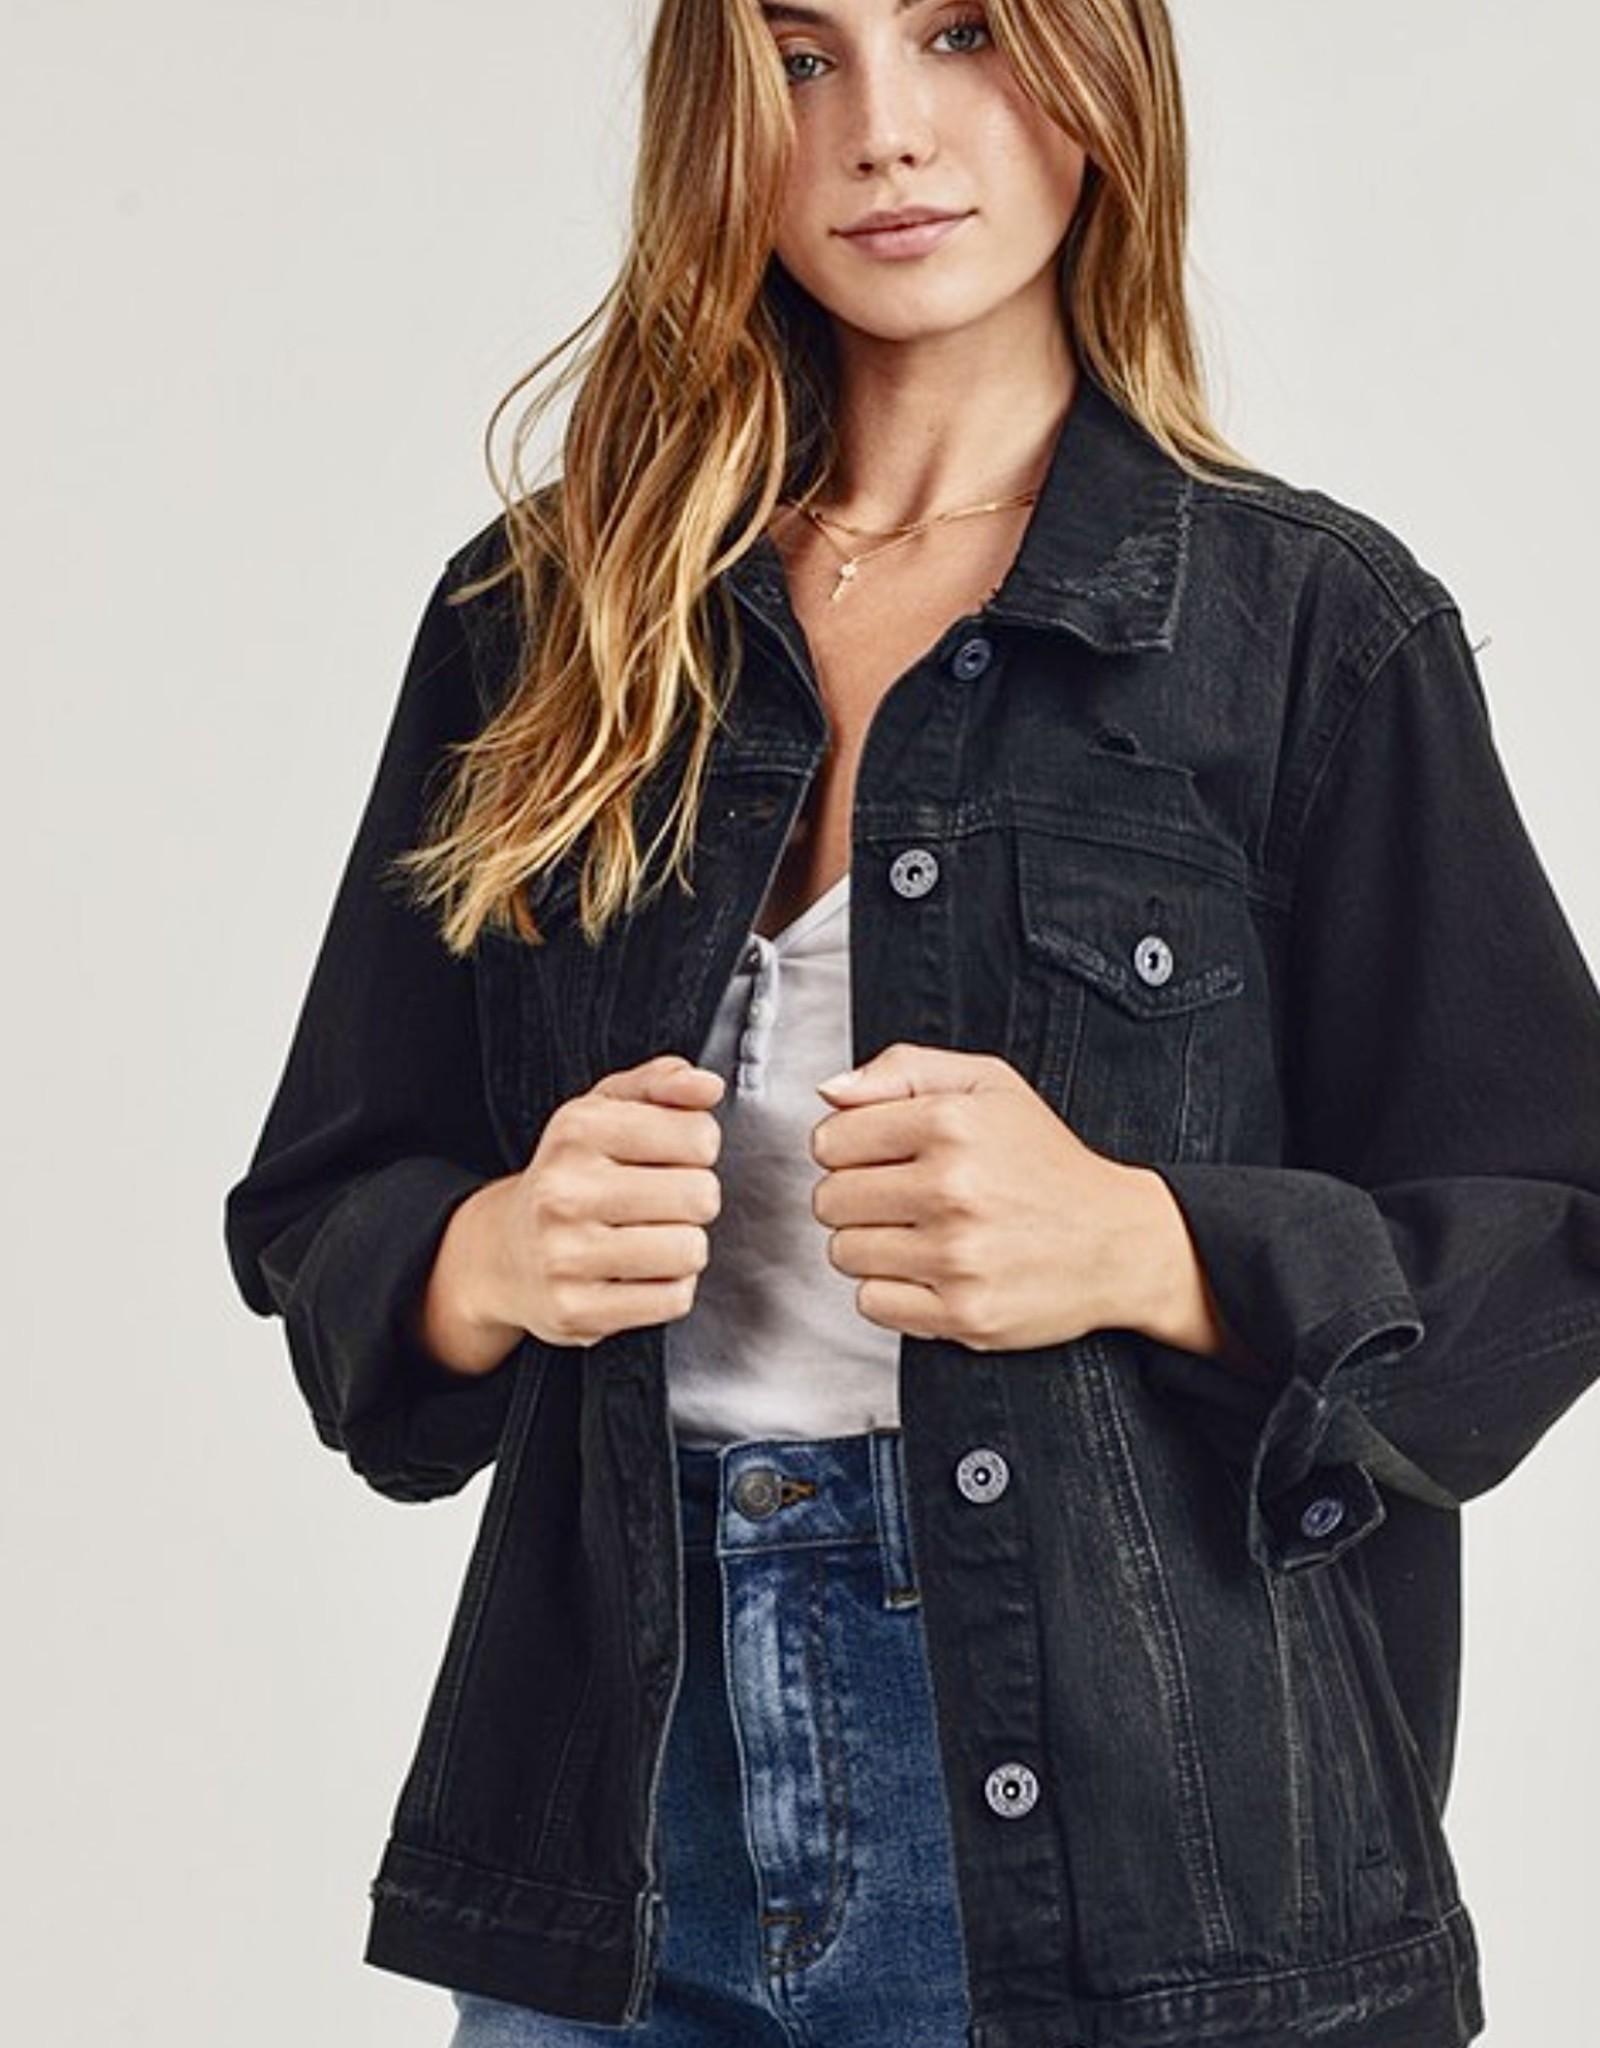 HUSH Classic vinatge style denim jacket